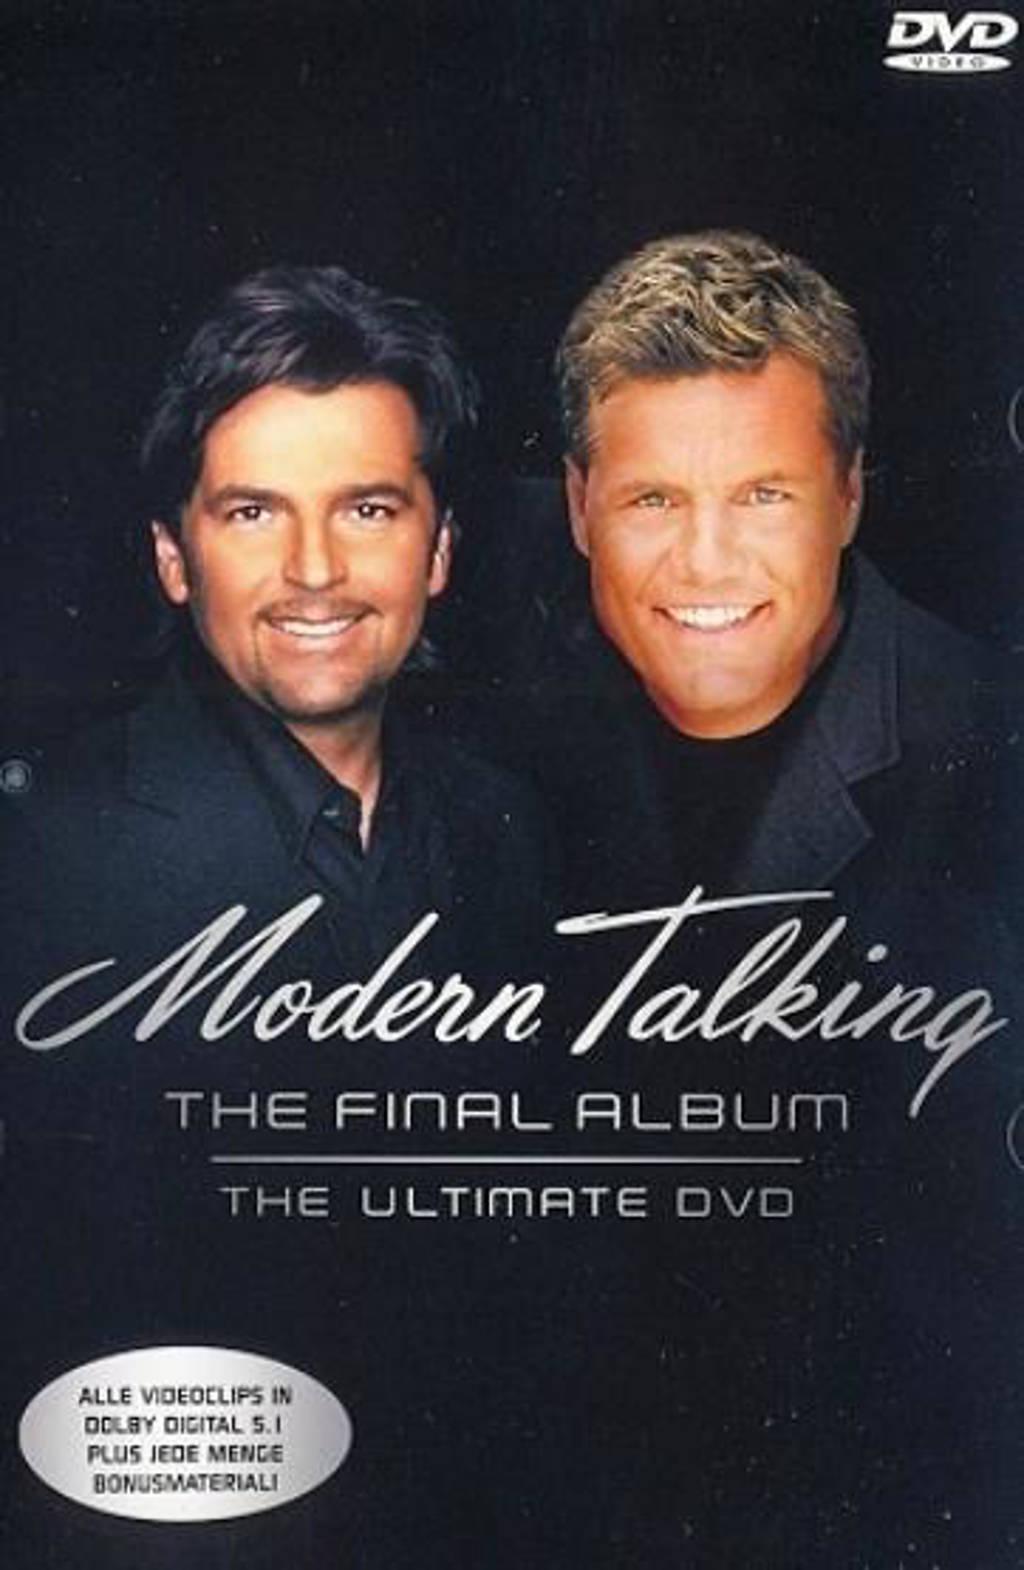 Modern Talking - final album (DVD)